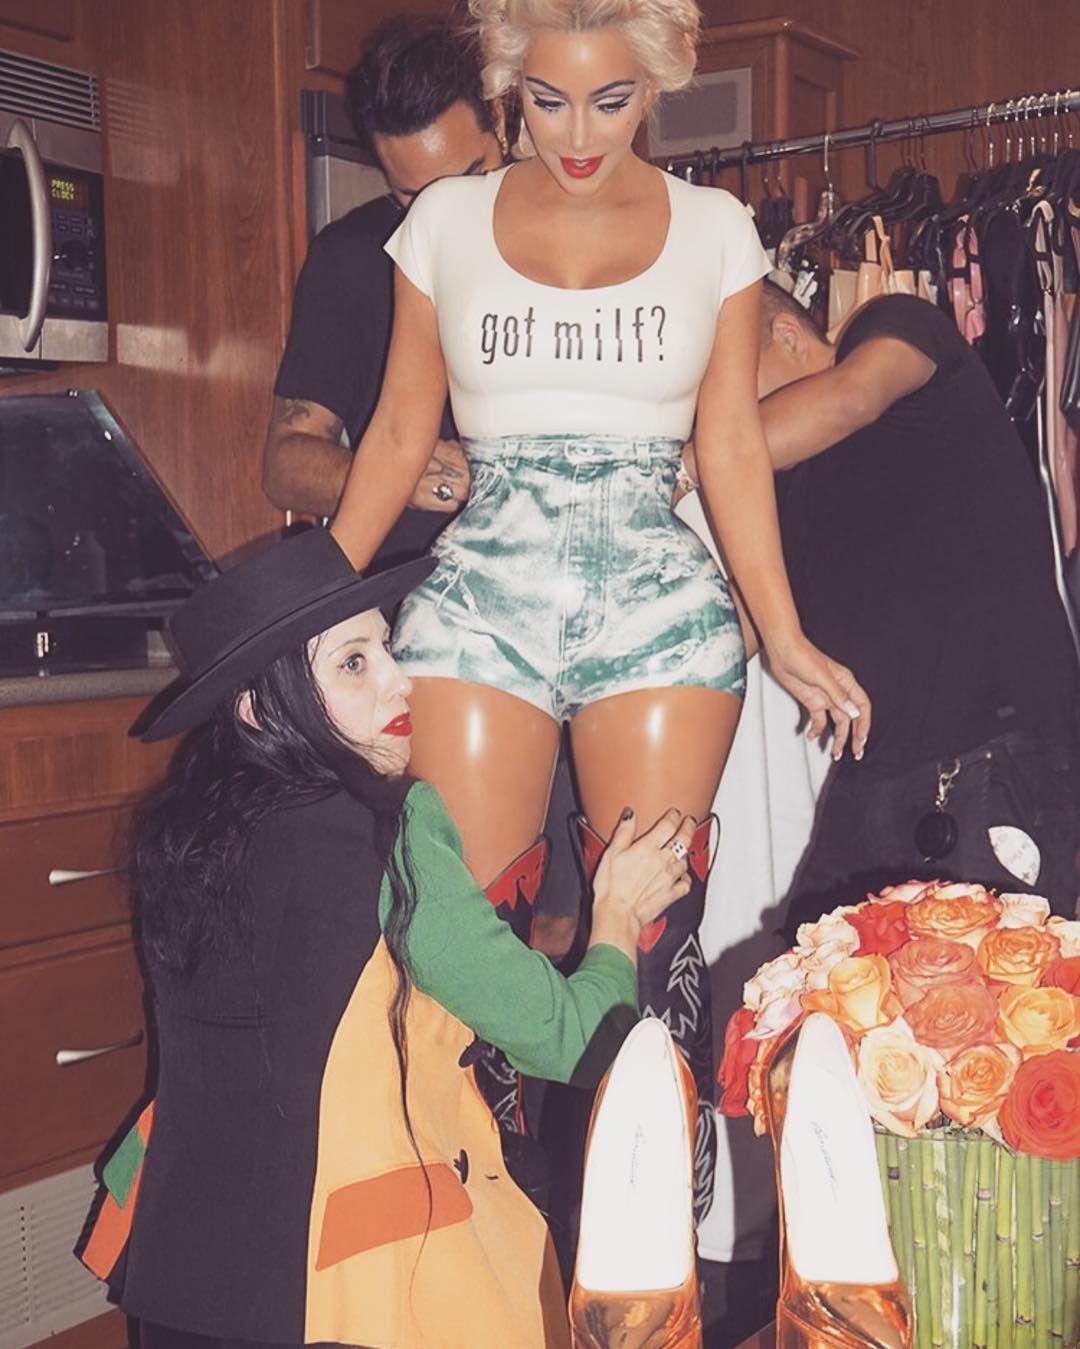 Kim-Kardashian-Sexy-Topless-3 (1)